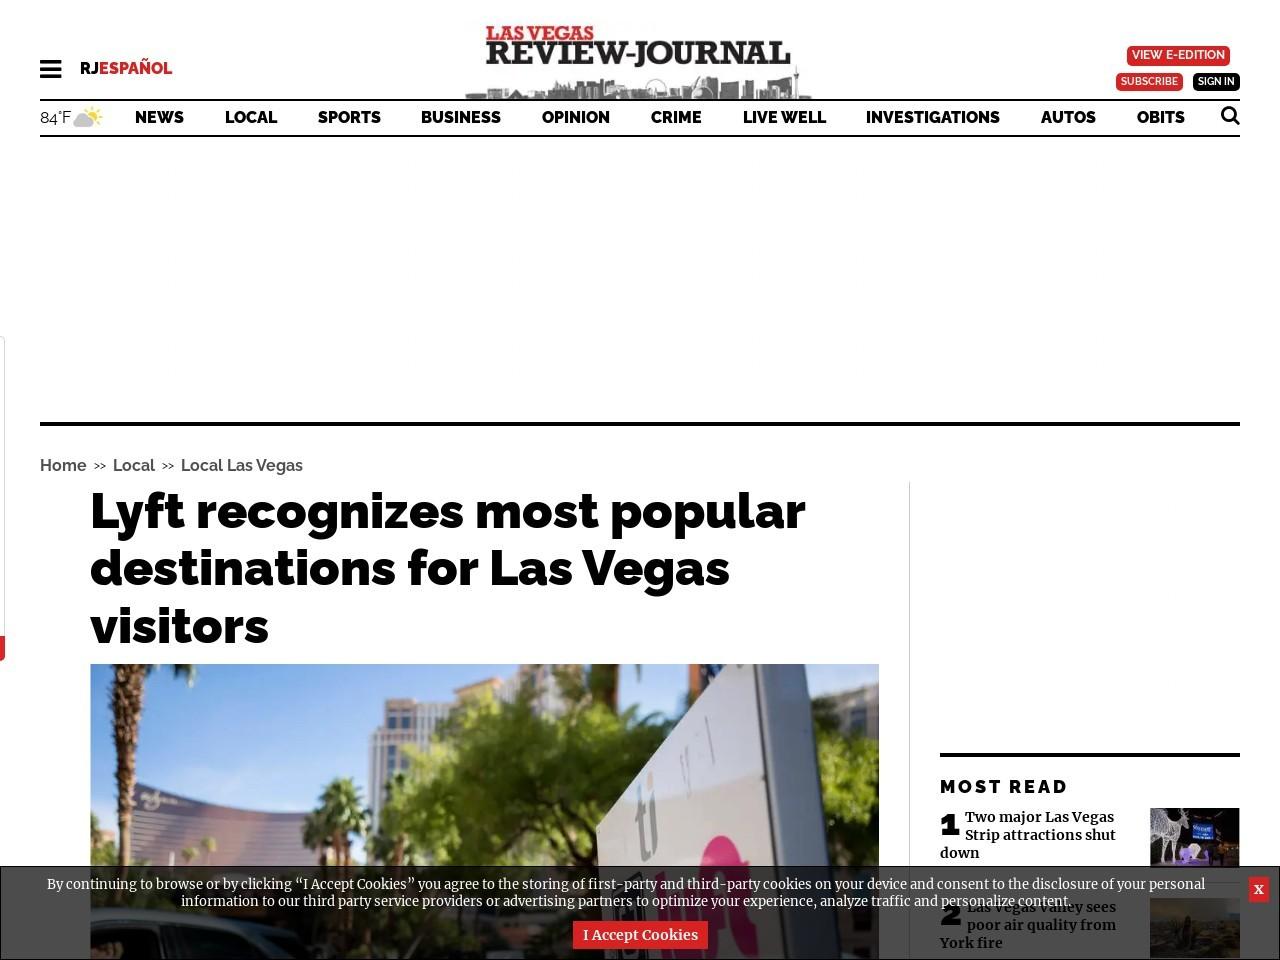 Lyft recognizes most popular destinations for visitors to Las Vegas